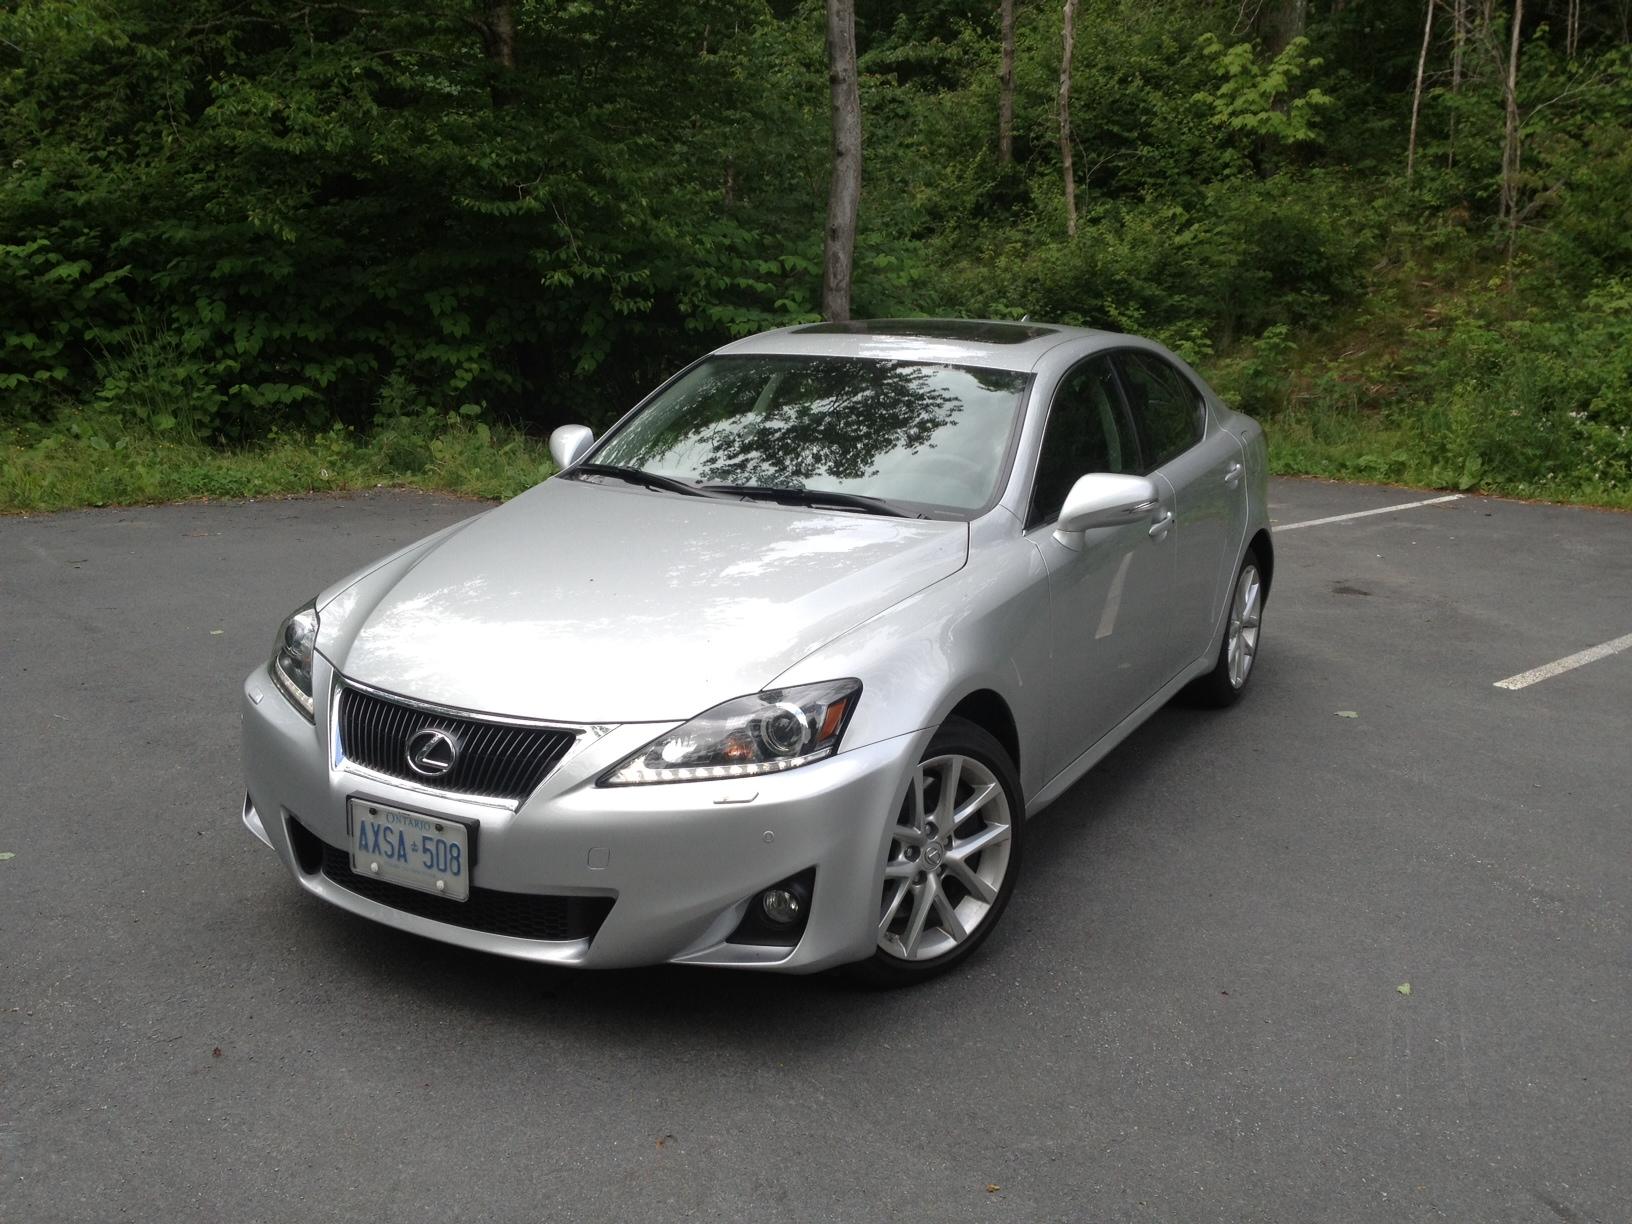 sedan exterior base front wheel reviews rear price view lexus drive photos features is